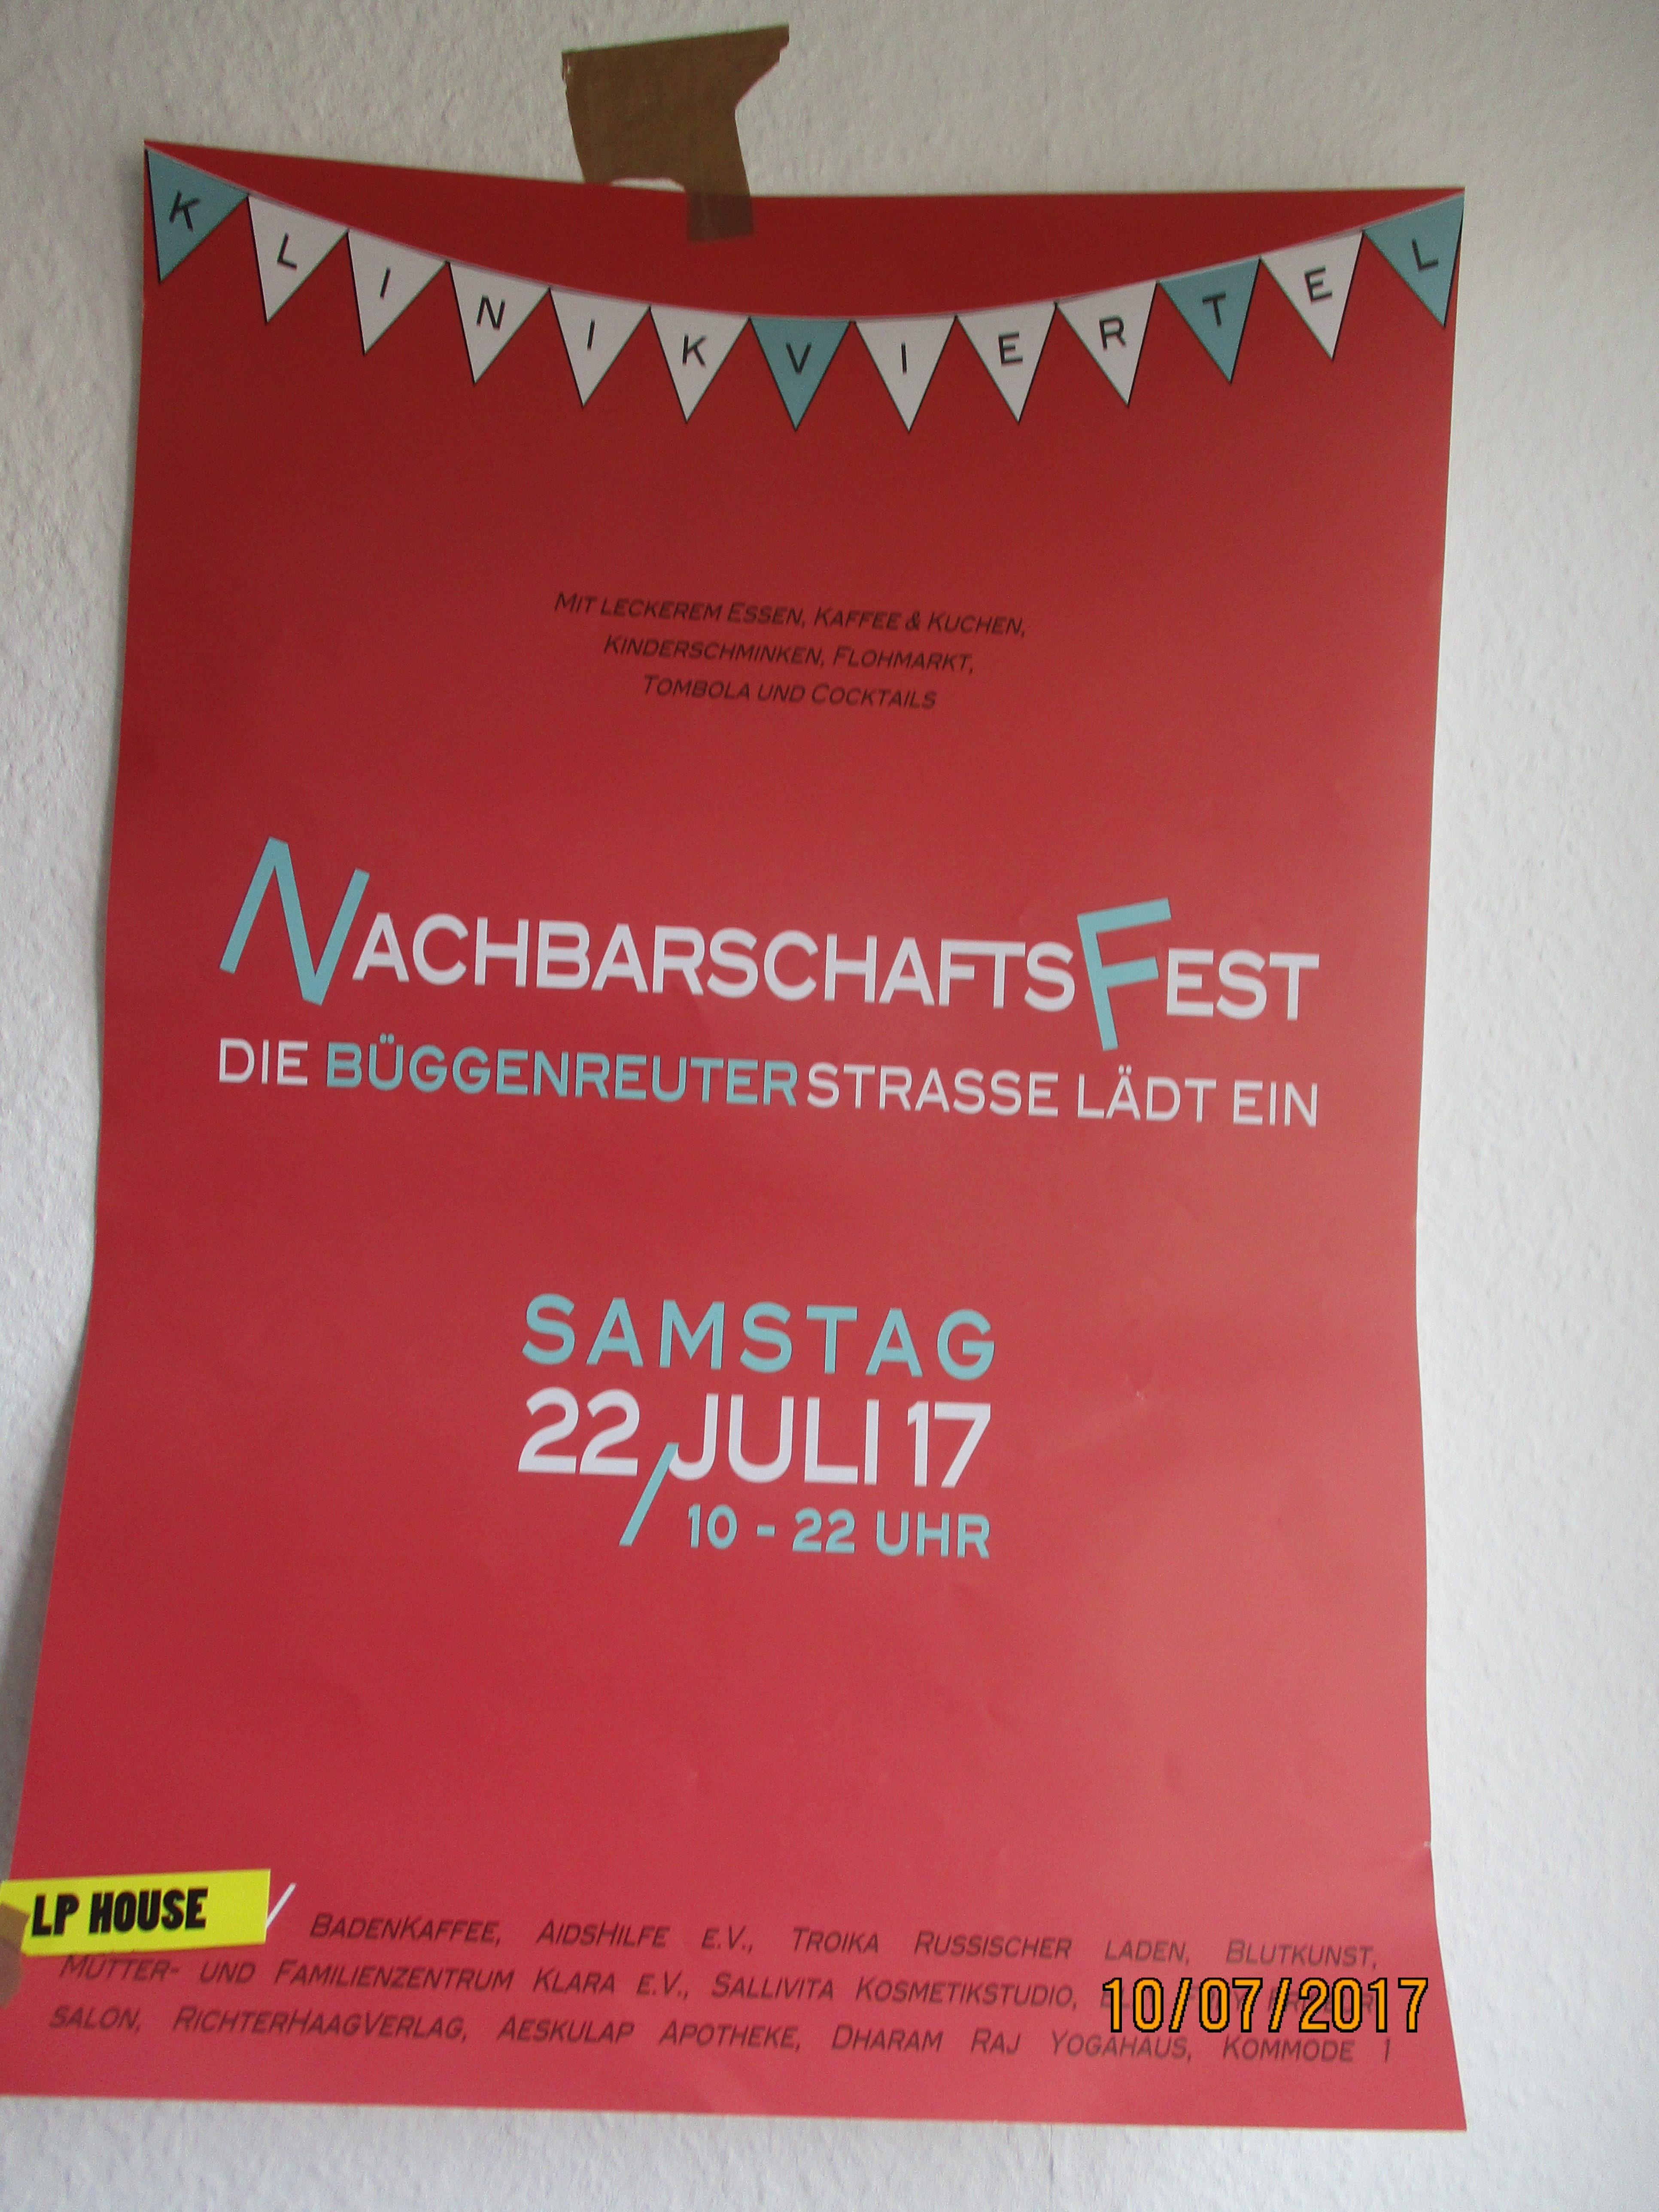 BÜGGENREUTER STRAßE FEST